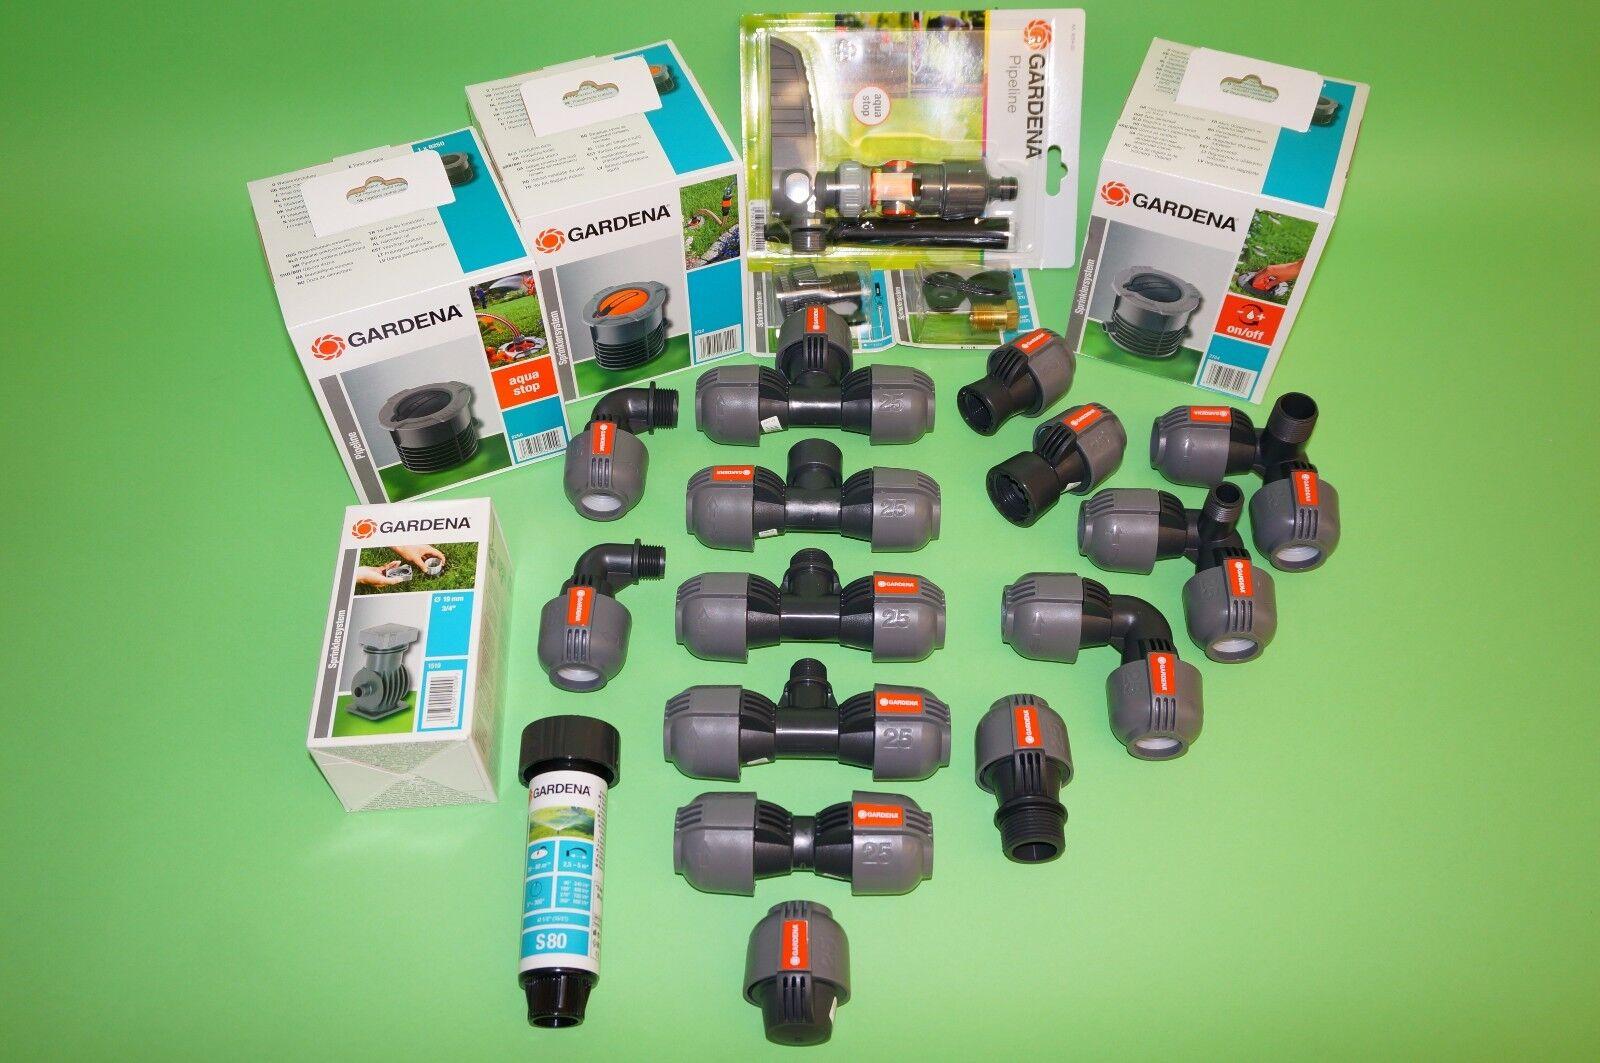 GARDENA® Pipeline Verbinder L- / T-Stück Winkel Adapter Anschlussdose - Auswahl